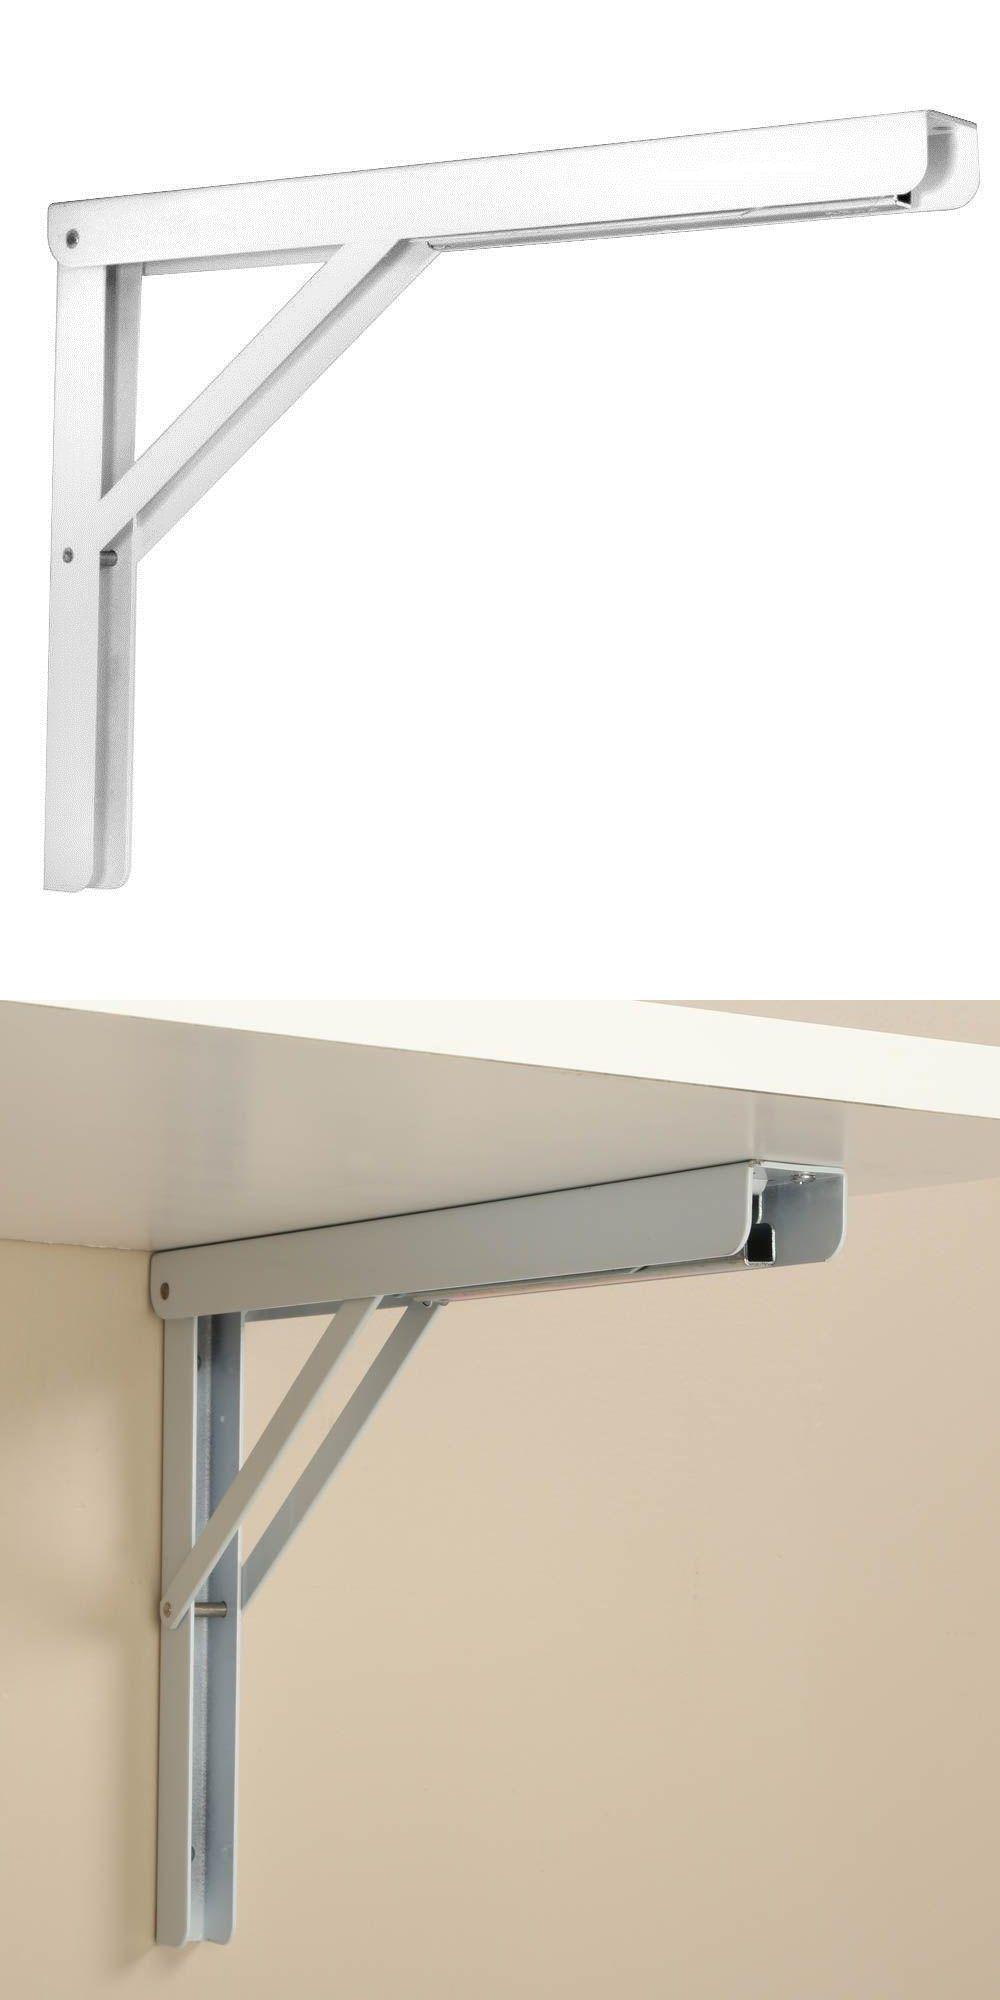 Braces And Brackets 45816 16 In Heavy Duty Folding Shelf Bracket In White Buy It Now Only 36 59 On Ebay Arsitektur Meja